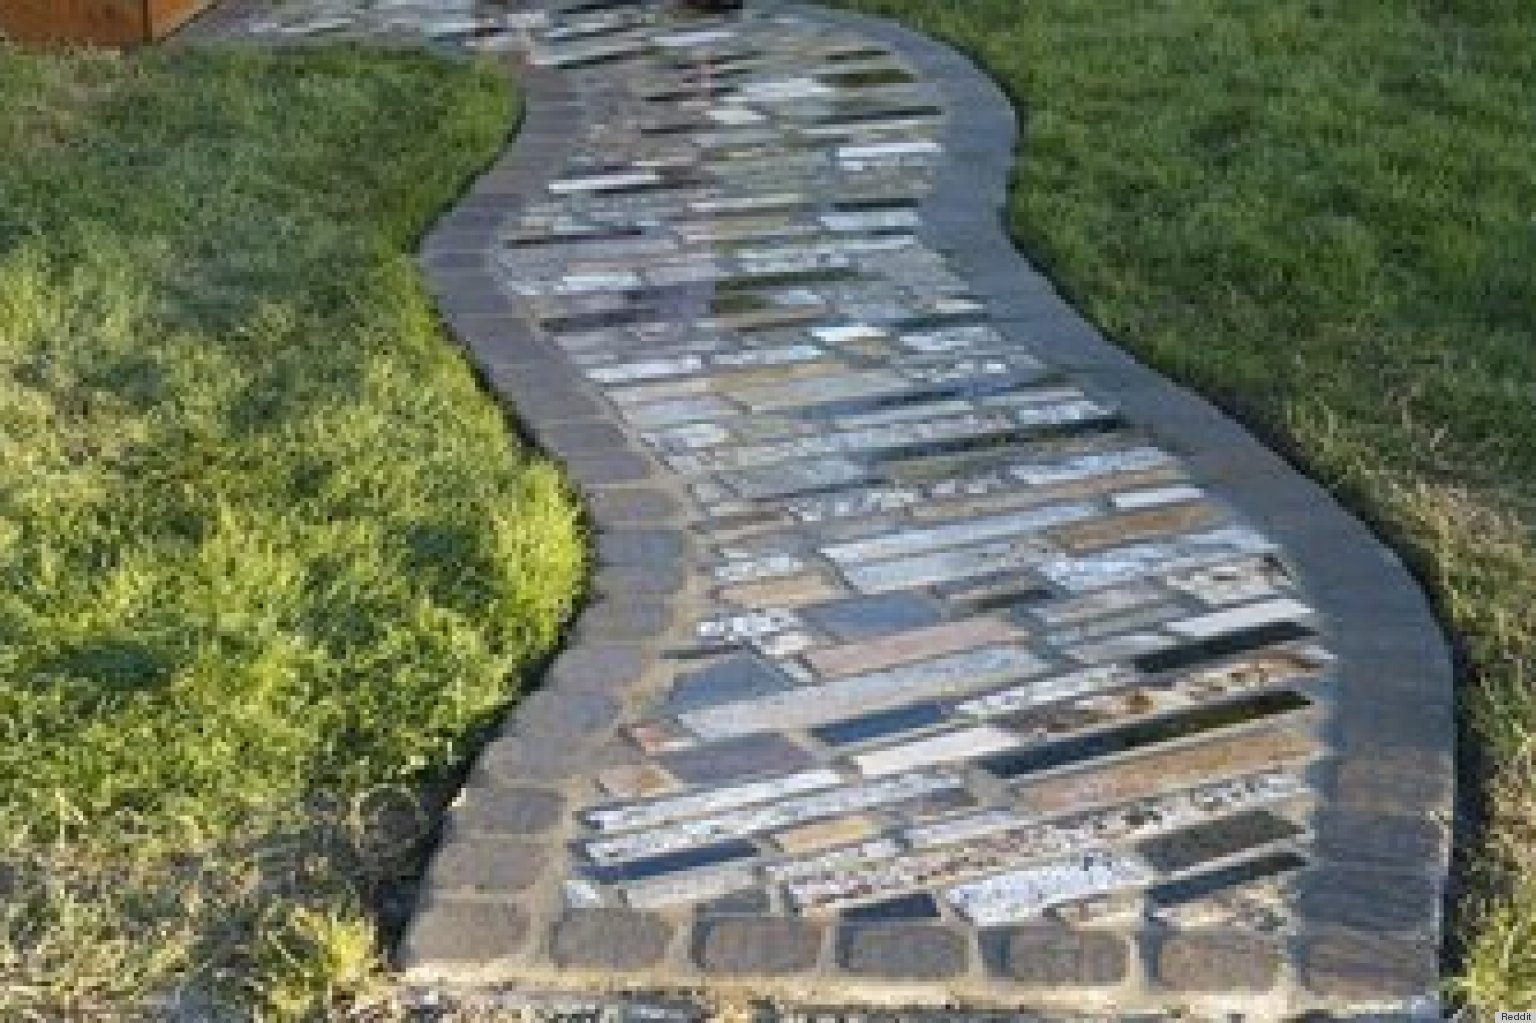 Couple Builds Impressive DIY Walkway Using Free Scraps Of ... on Backyard Walkway Ideas  id=19308